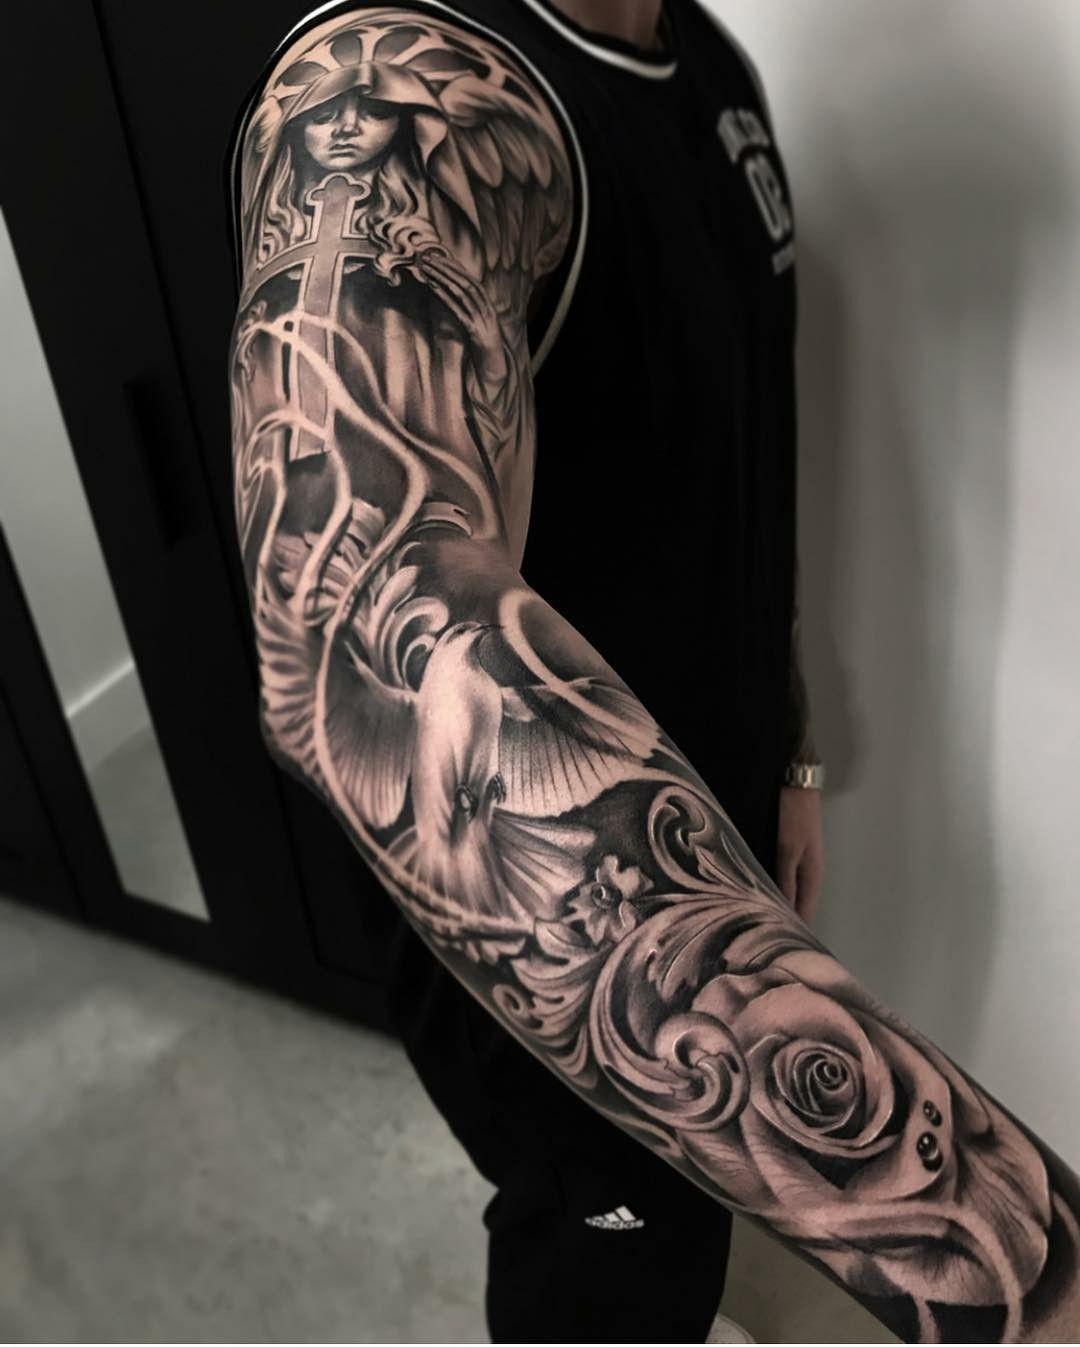 Tatuaje Religioso Tattoo Pinterest Tatuajes Religiosos